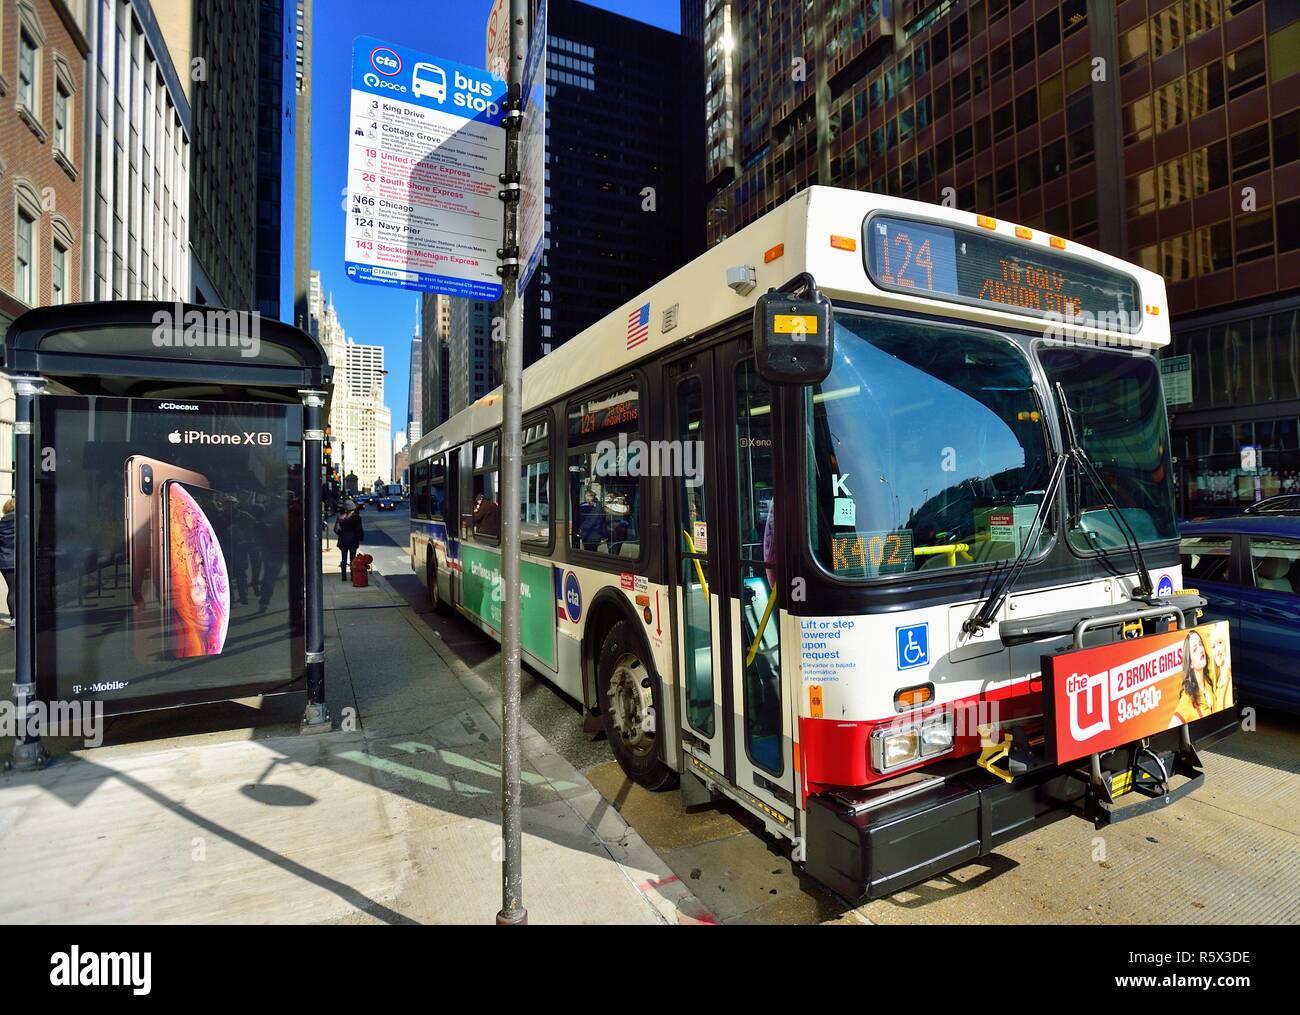 Cta Bus Chicago Stock Photos & Cta Bus Chicago Stock Images